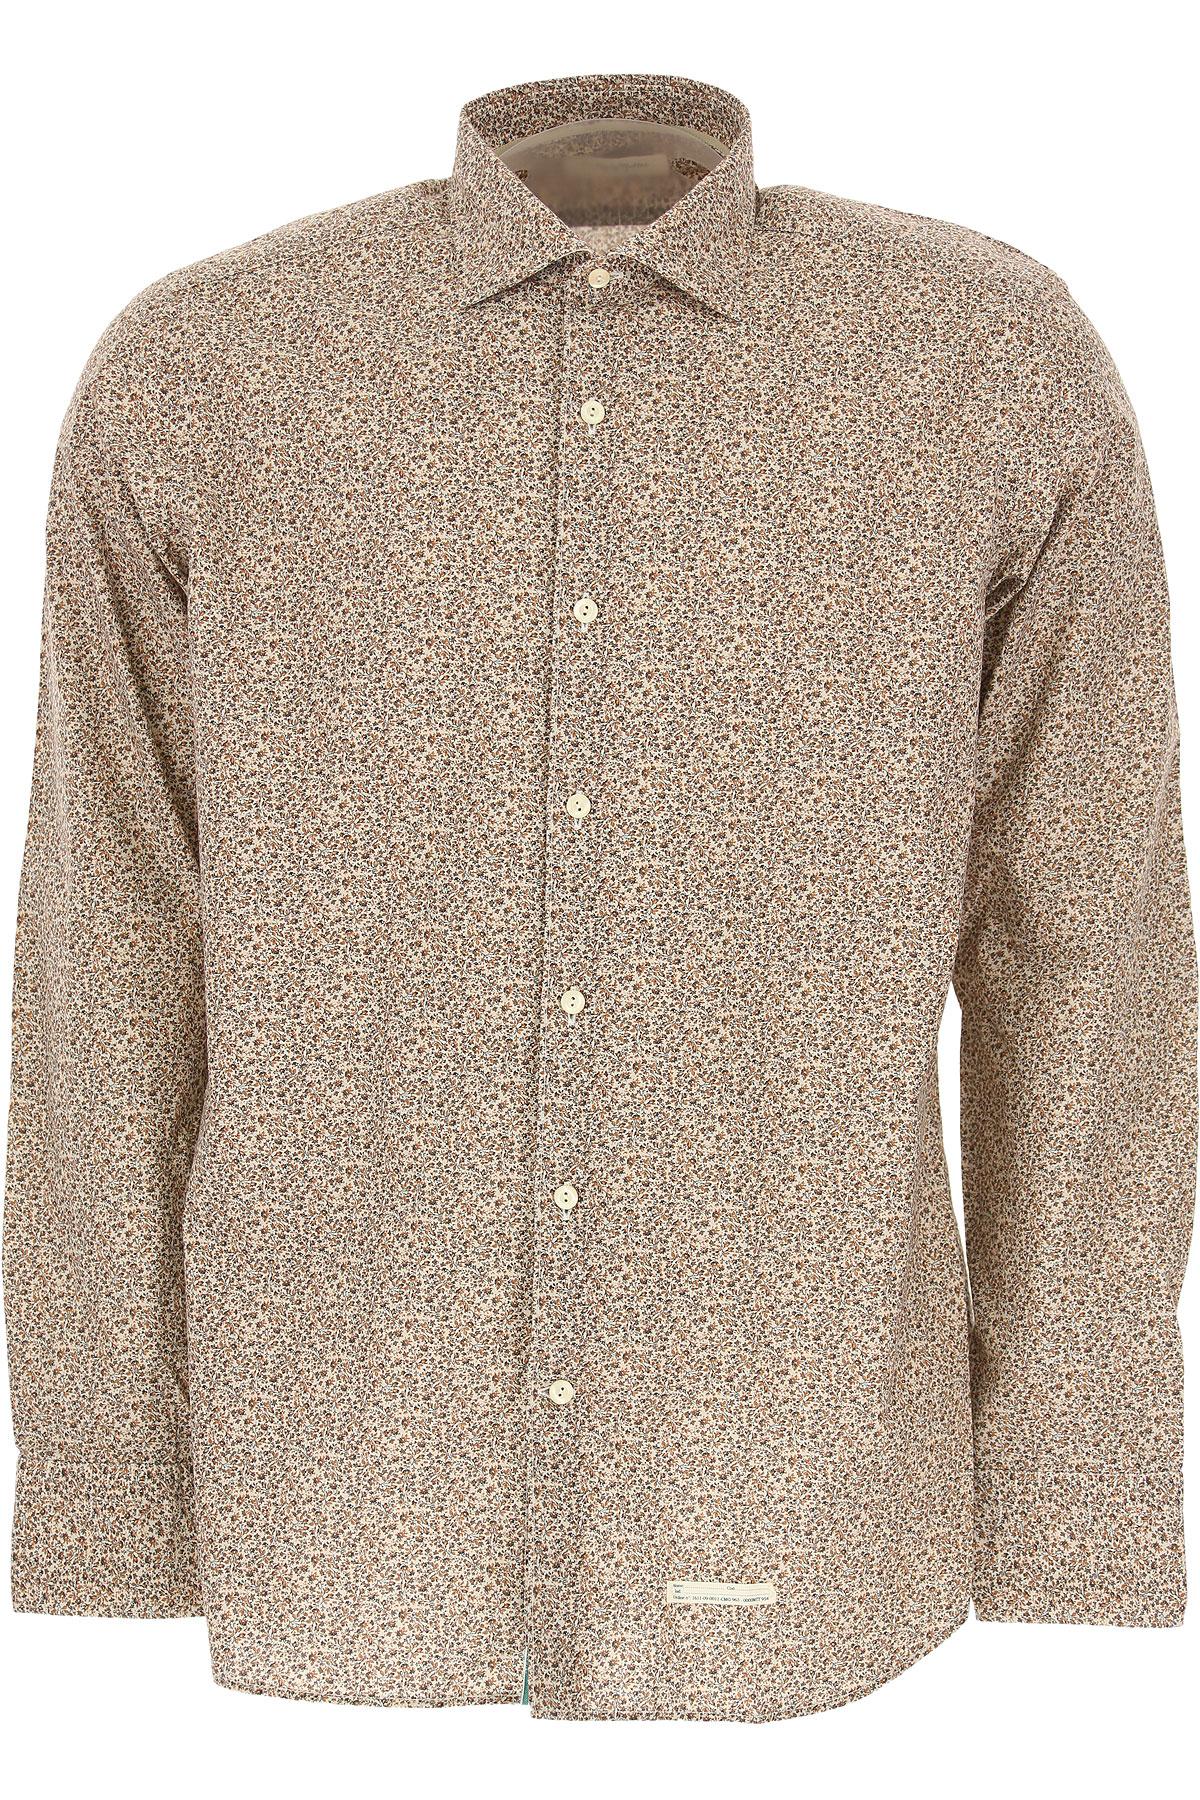 Tintoria Mattei 954 Shirt for Men On Sale, Beige, Cotton, 2019, 16.5 17